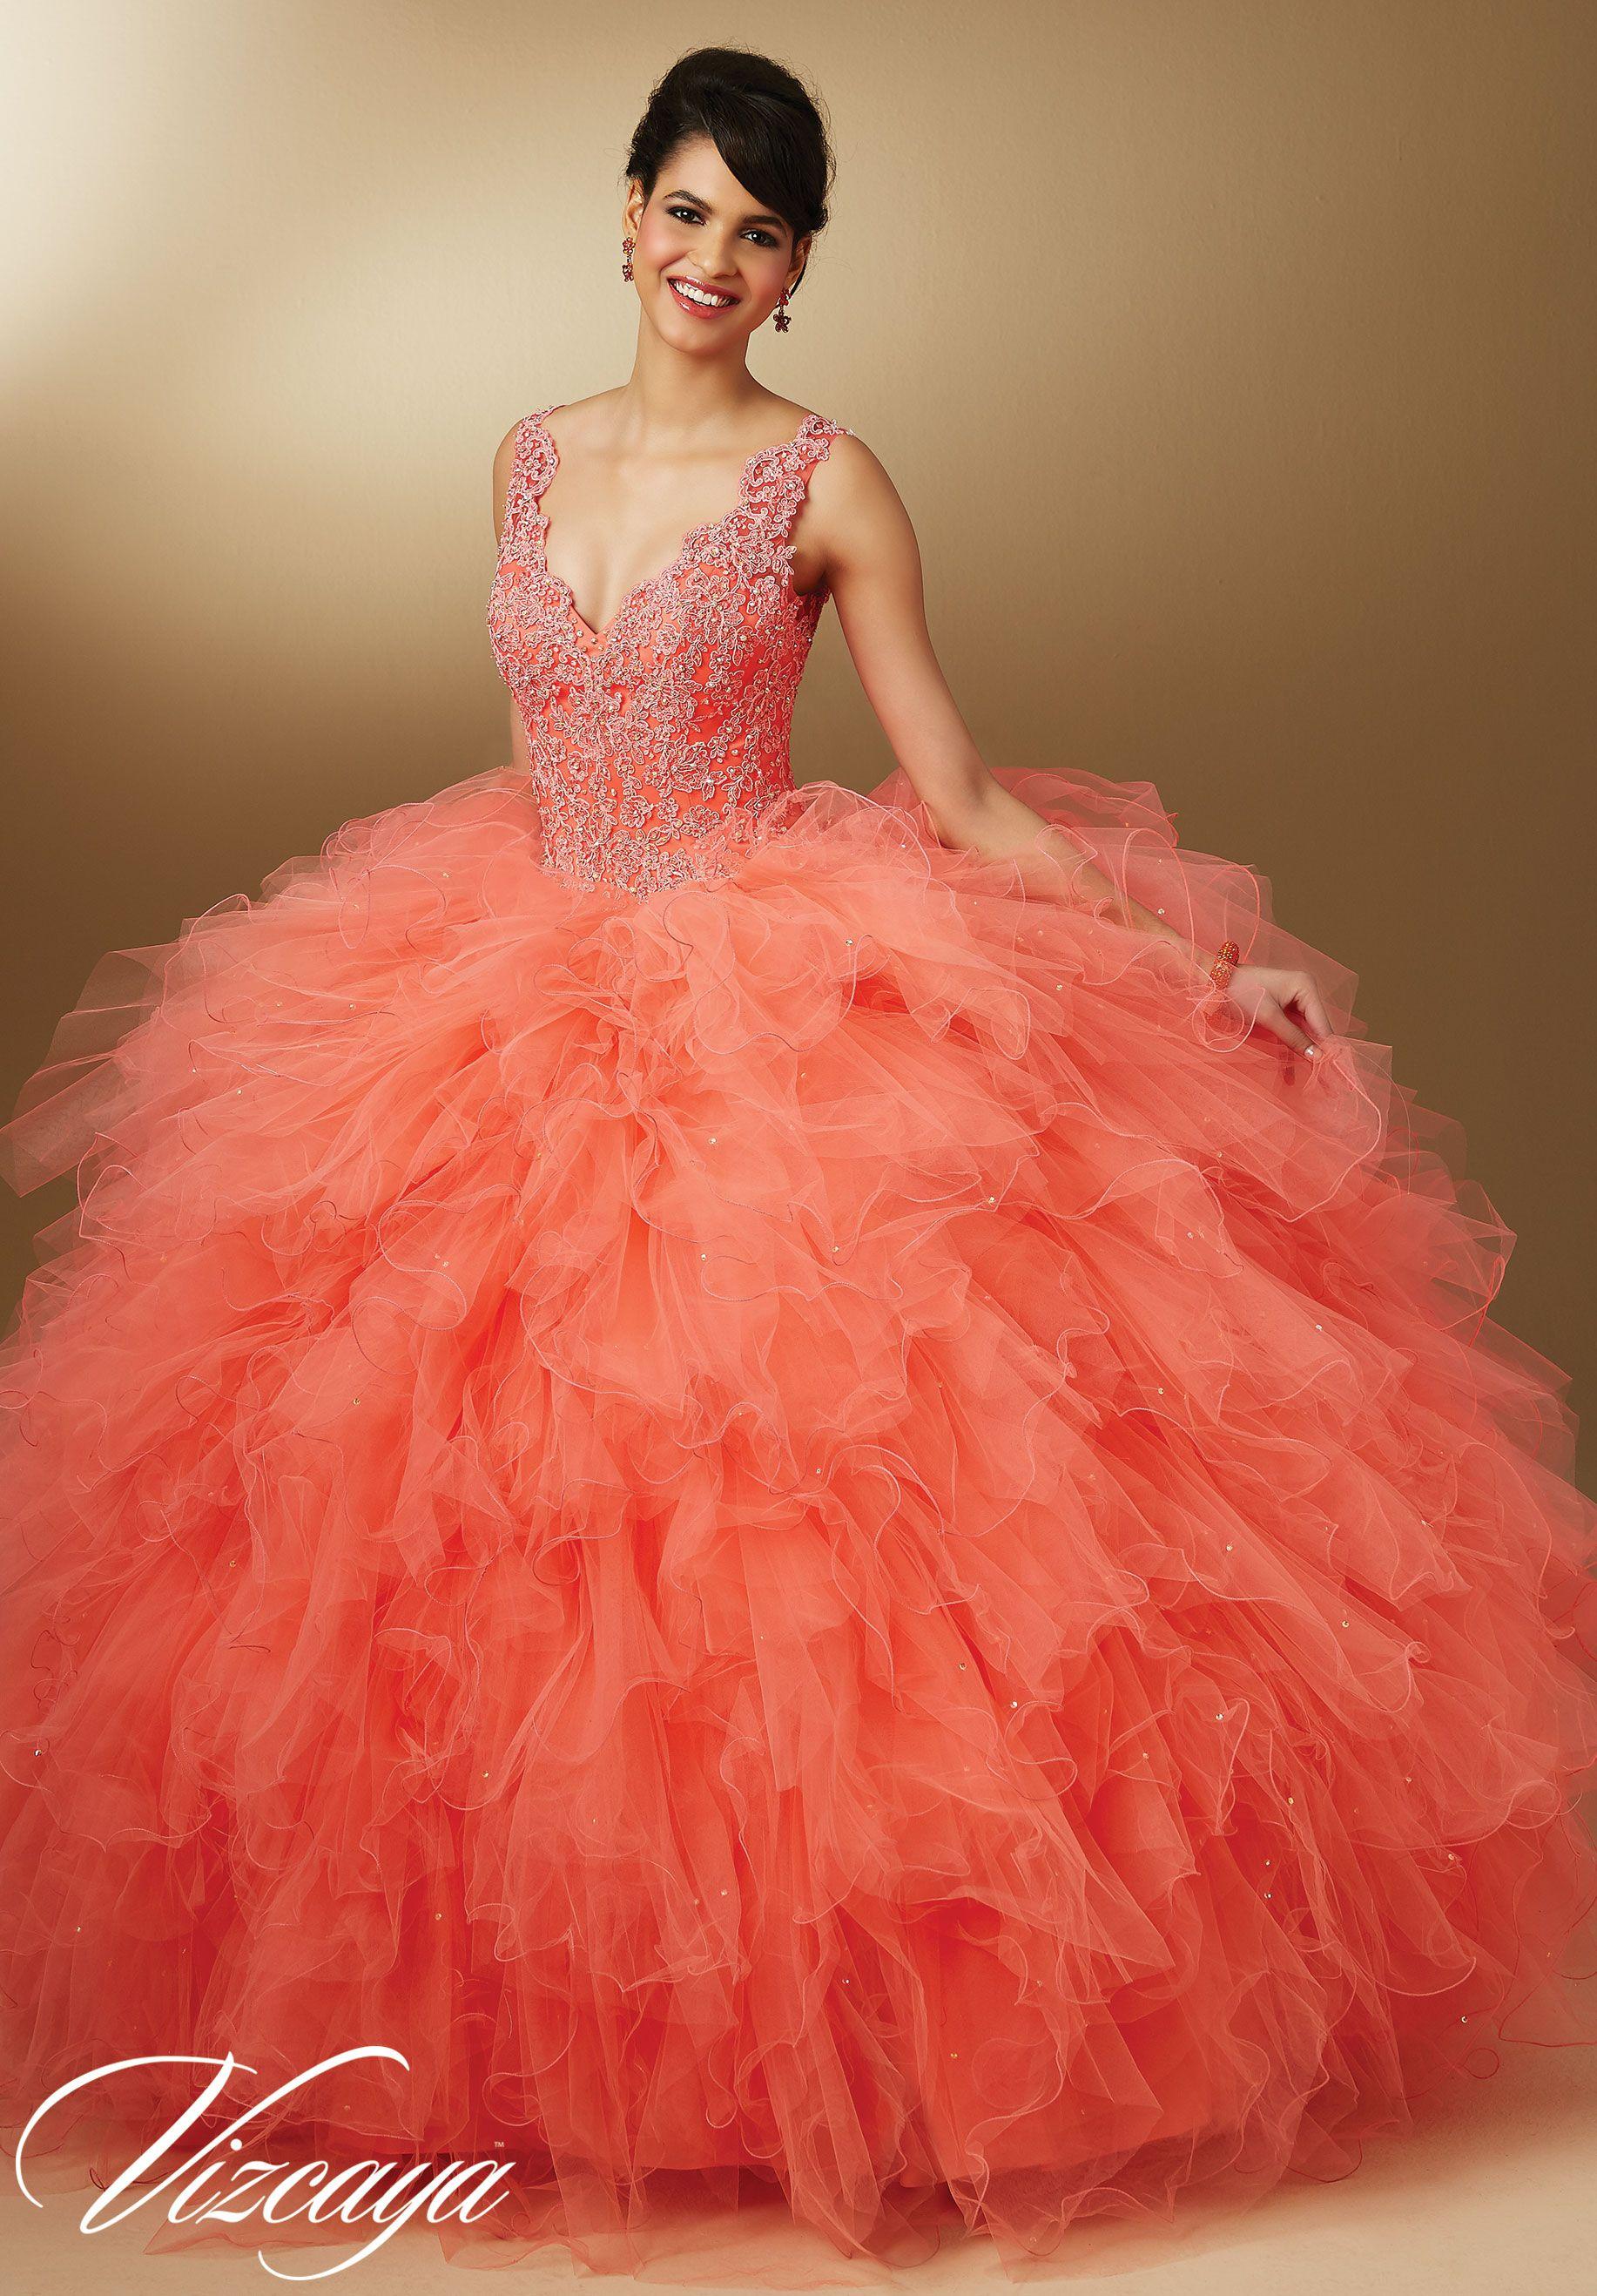 Champagne colored quince dresses aqua